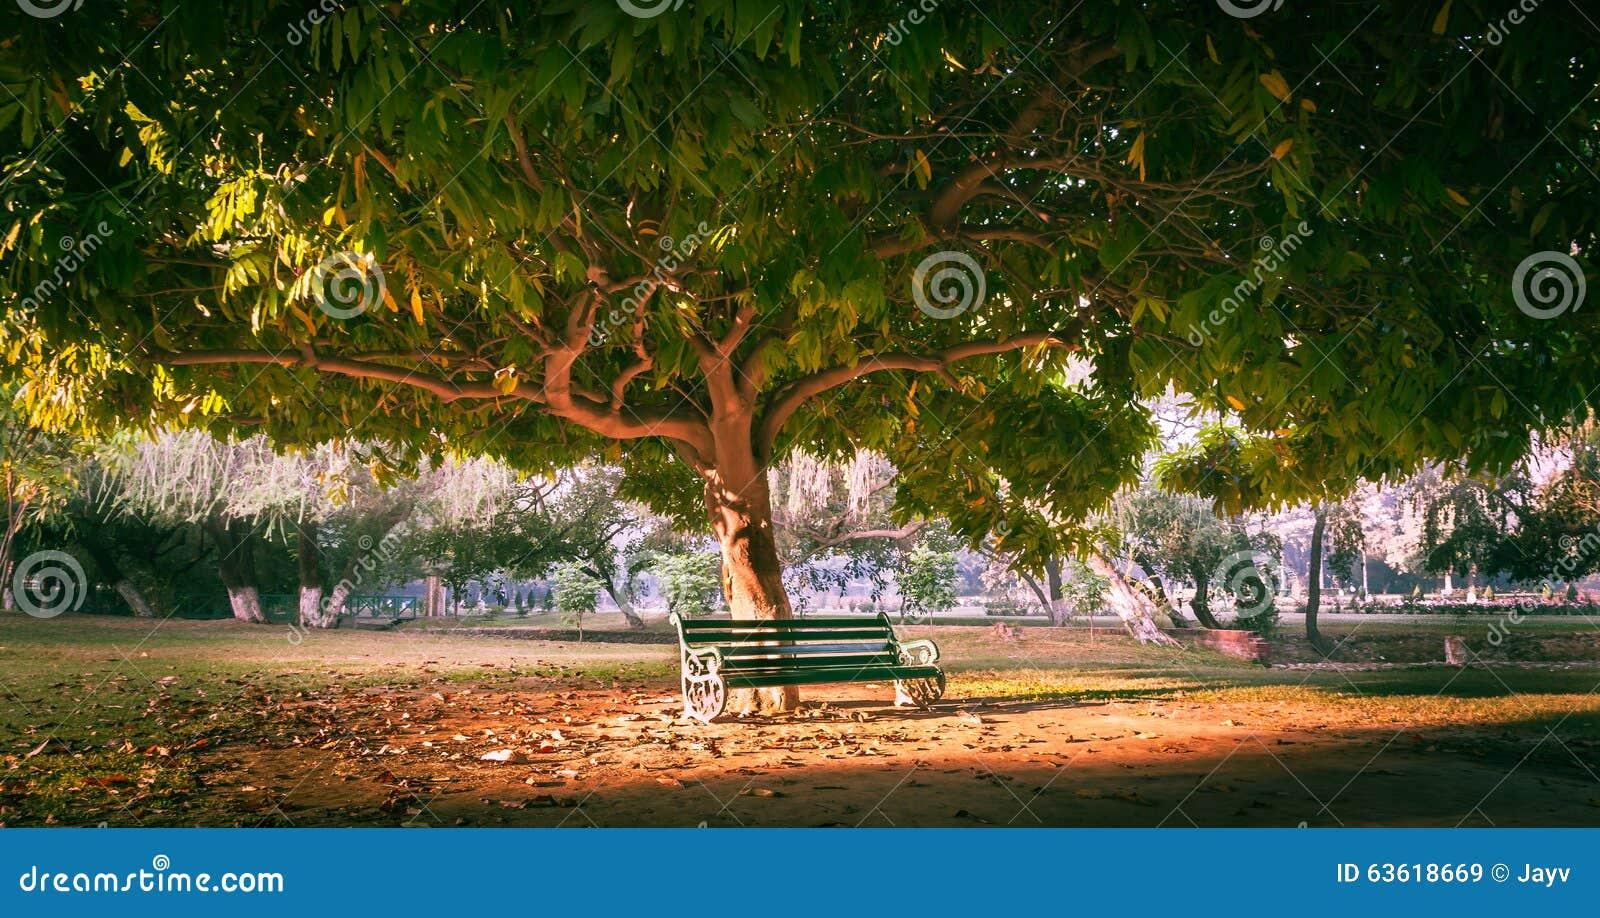 Park Bench Under Tree Stock Photo - Image: 63618669